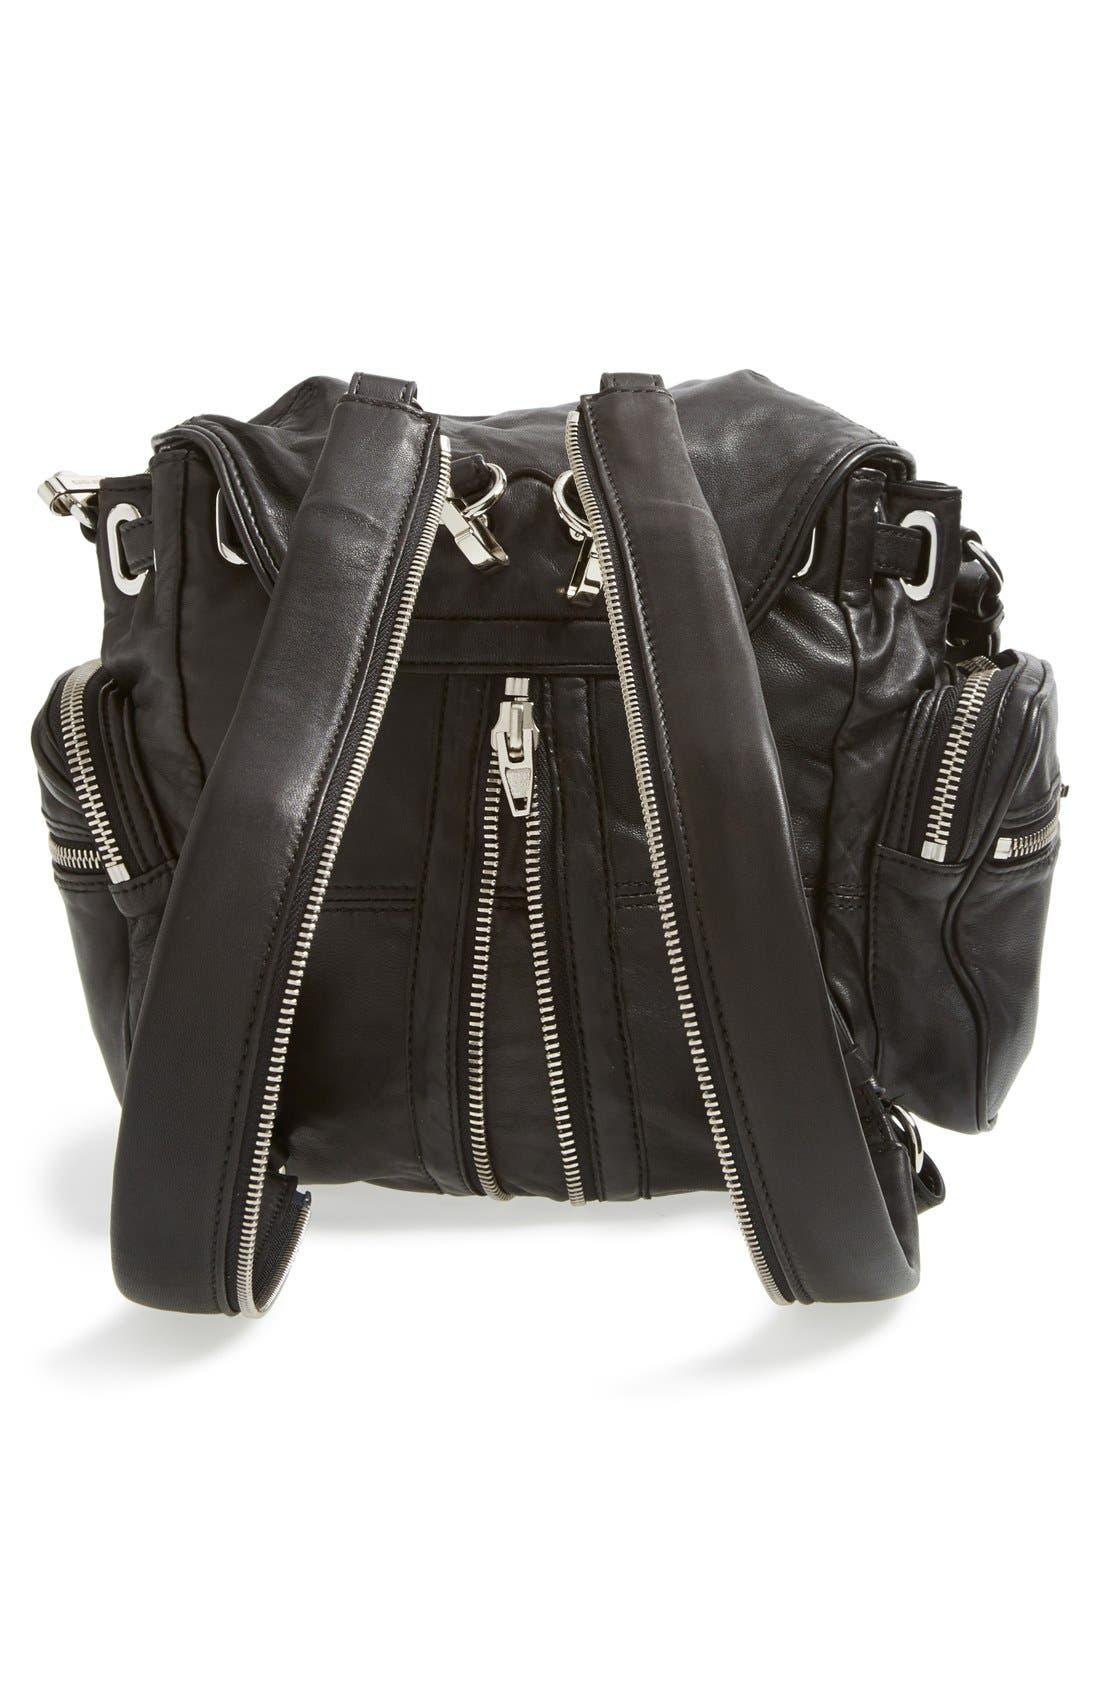 ALEXANDER WANG, 'Mini Marti' Leather Backpack, Alternate thumbnail 4, color, BLACK SLVR HRDR